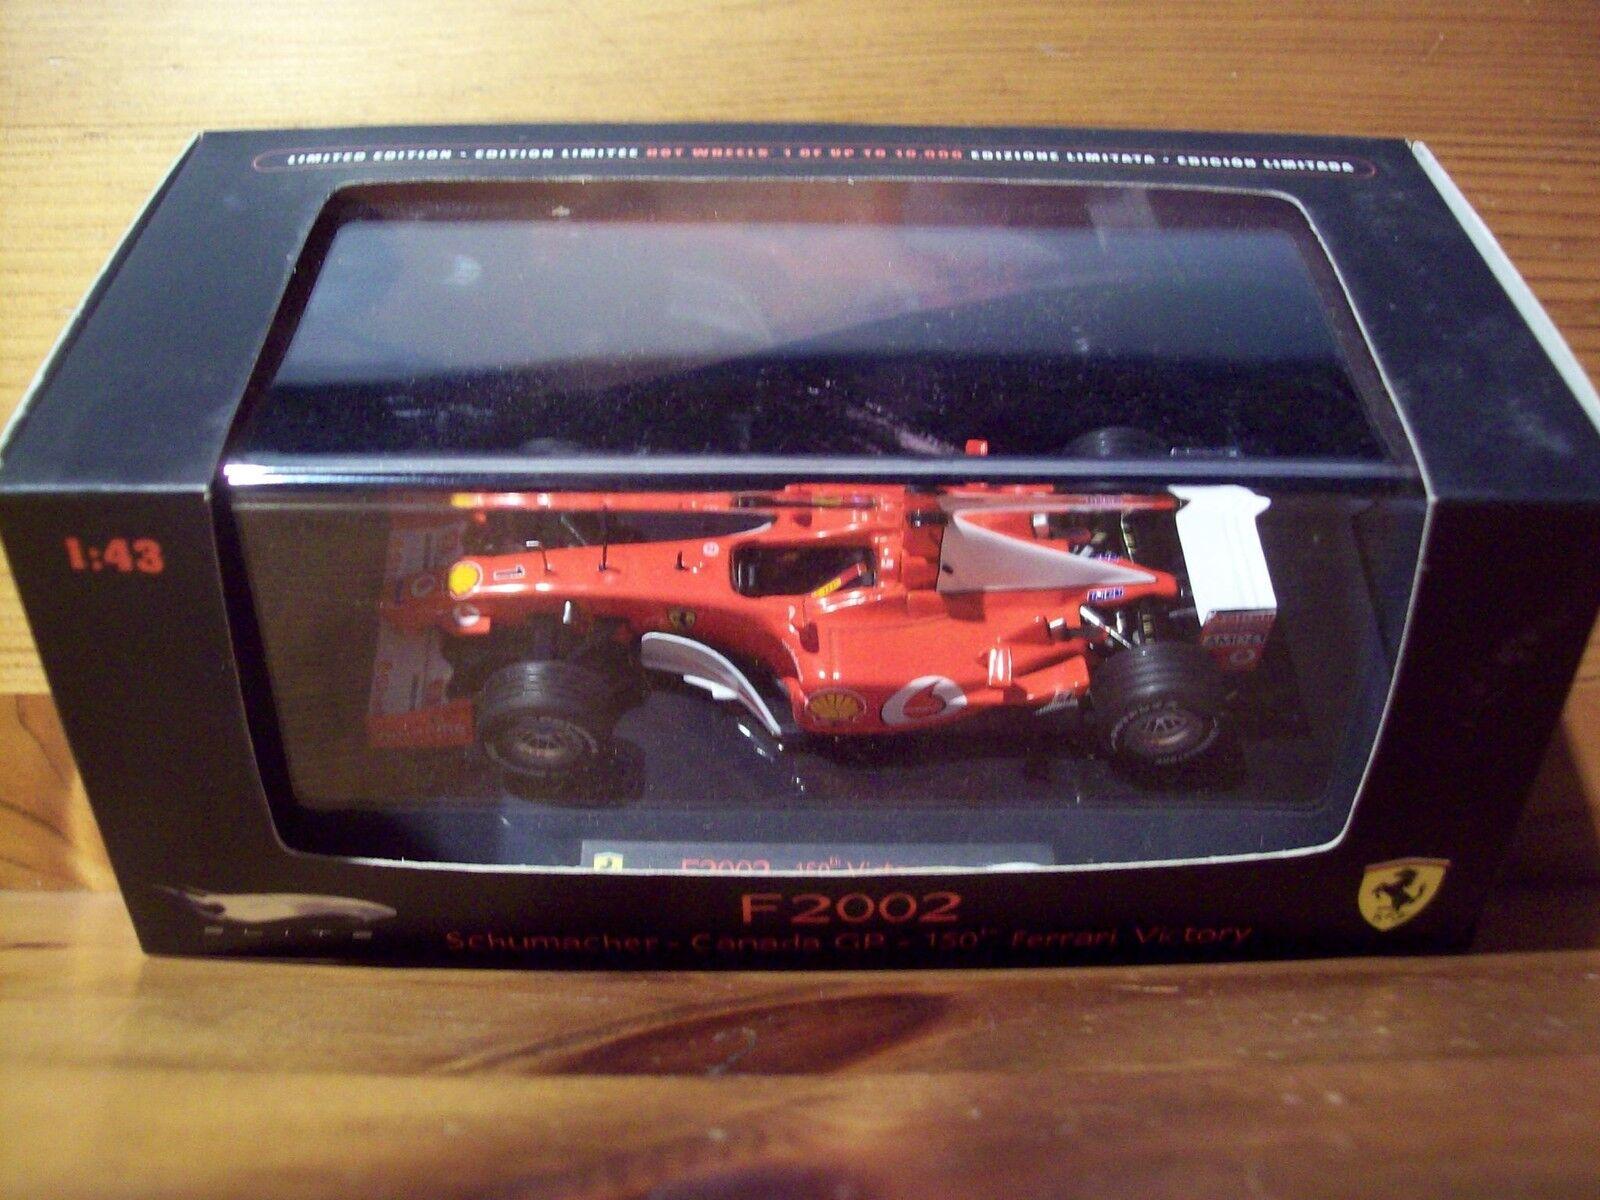 1/43 Mattel Elite Ferrari F2002 Michael Schumacher Schumacher Schumacher Canada GP 150th Ferrari Win fba5e1